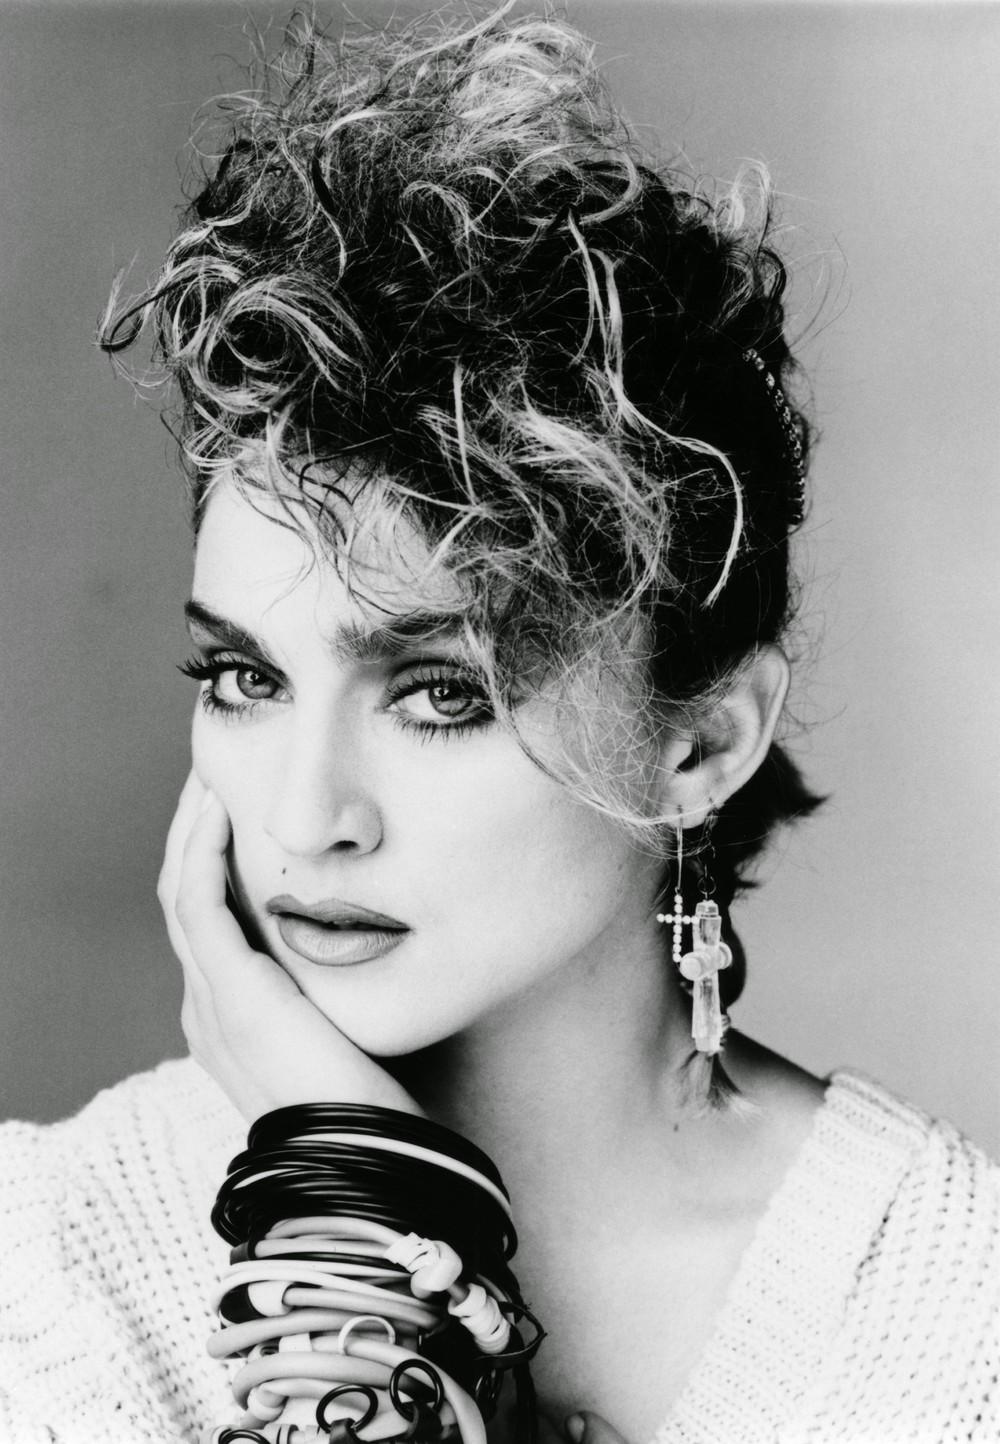 Madonna (b. 1958)